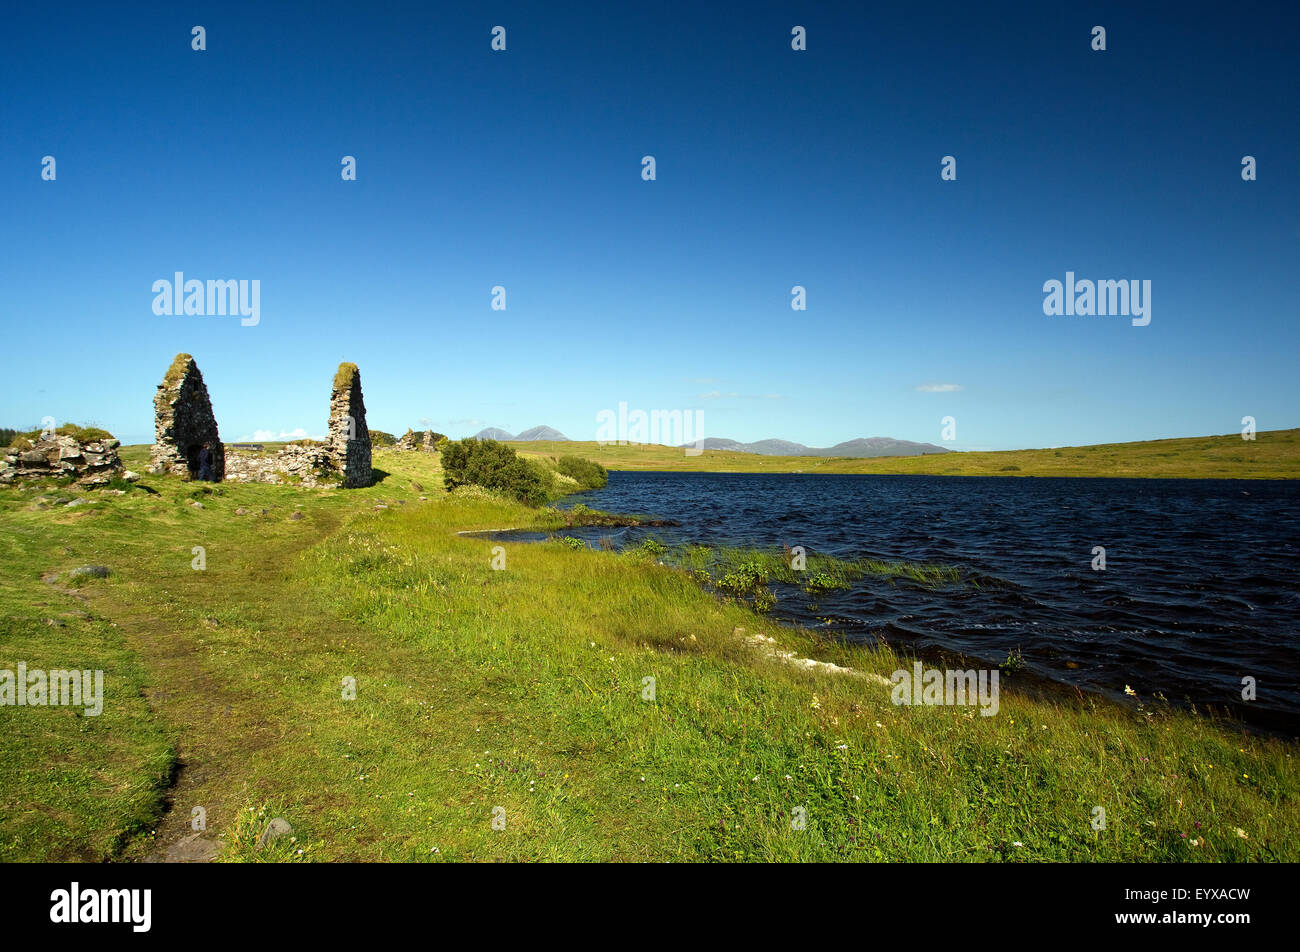 Finlaggan, Lordship of the Isles, Islay - Stock Image